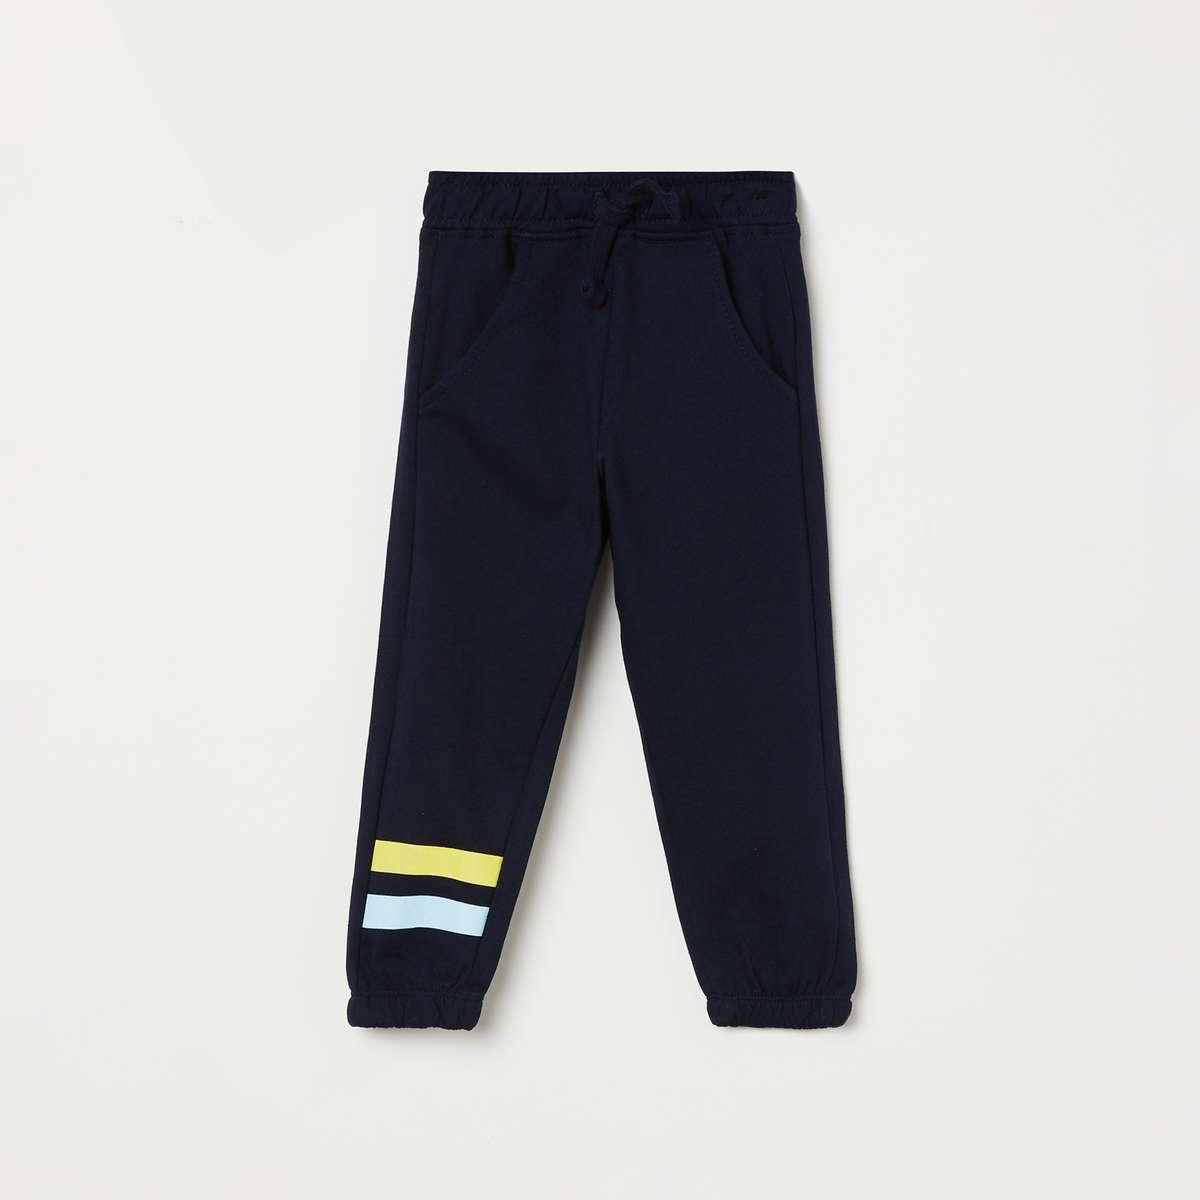 6.JUNIORS Boys Printed Track Pants